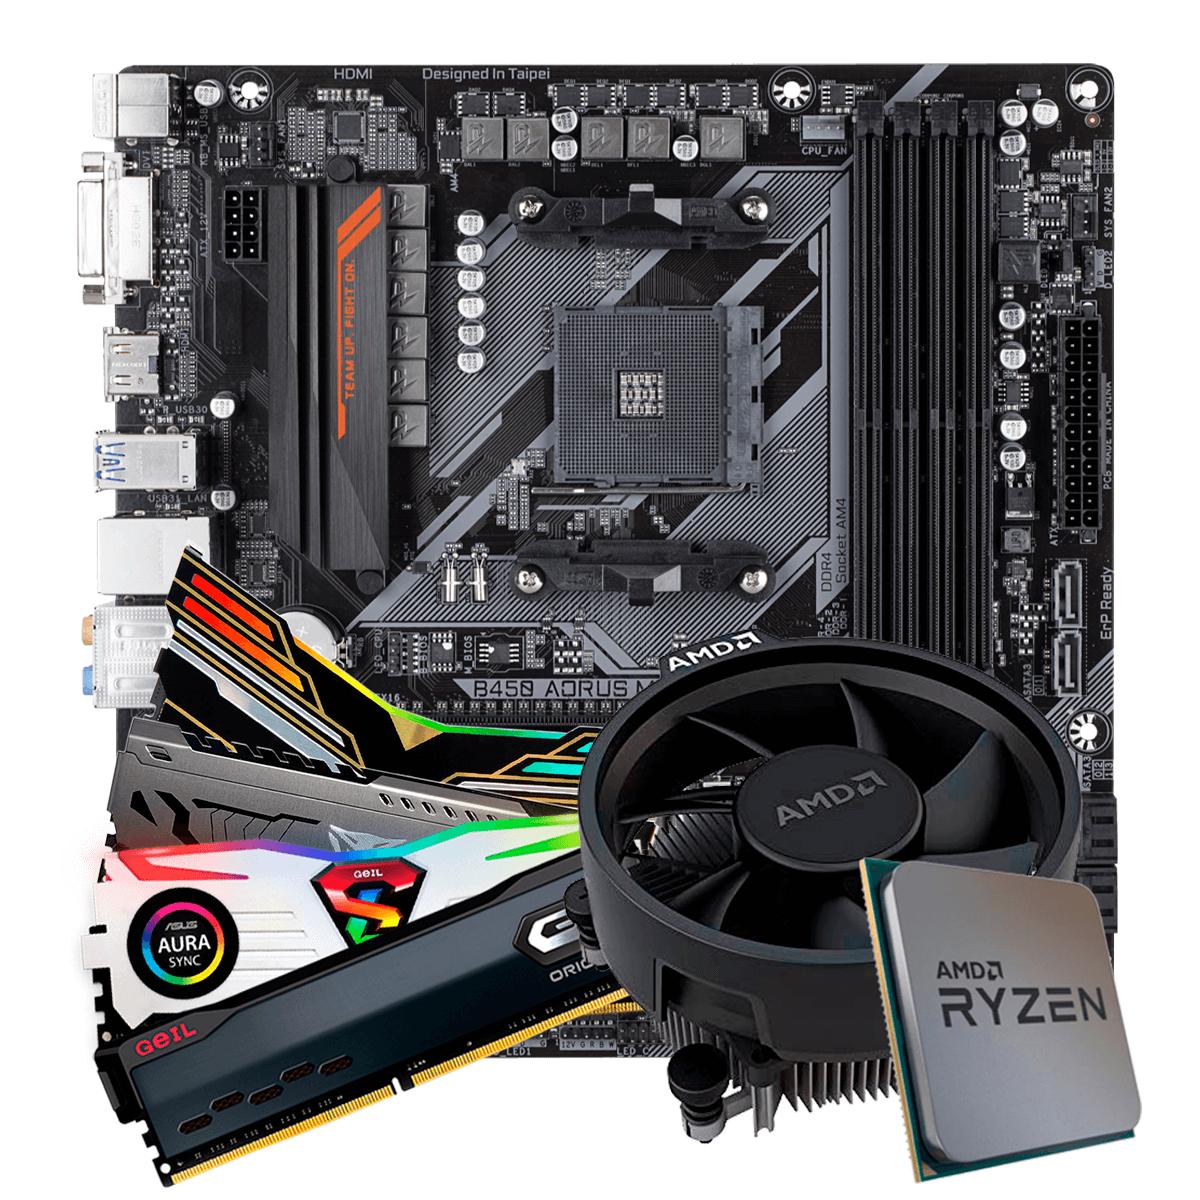 Kit Upgrade, AMD Ryzen 5 3500,Gigabyte B450 AORUS M, Memória DDR4 8GB 3000MHz